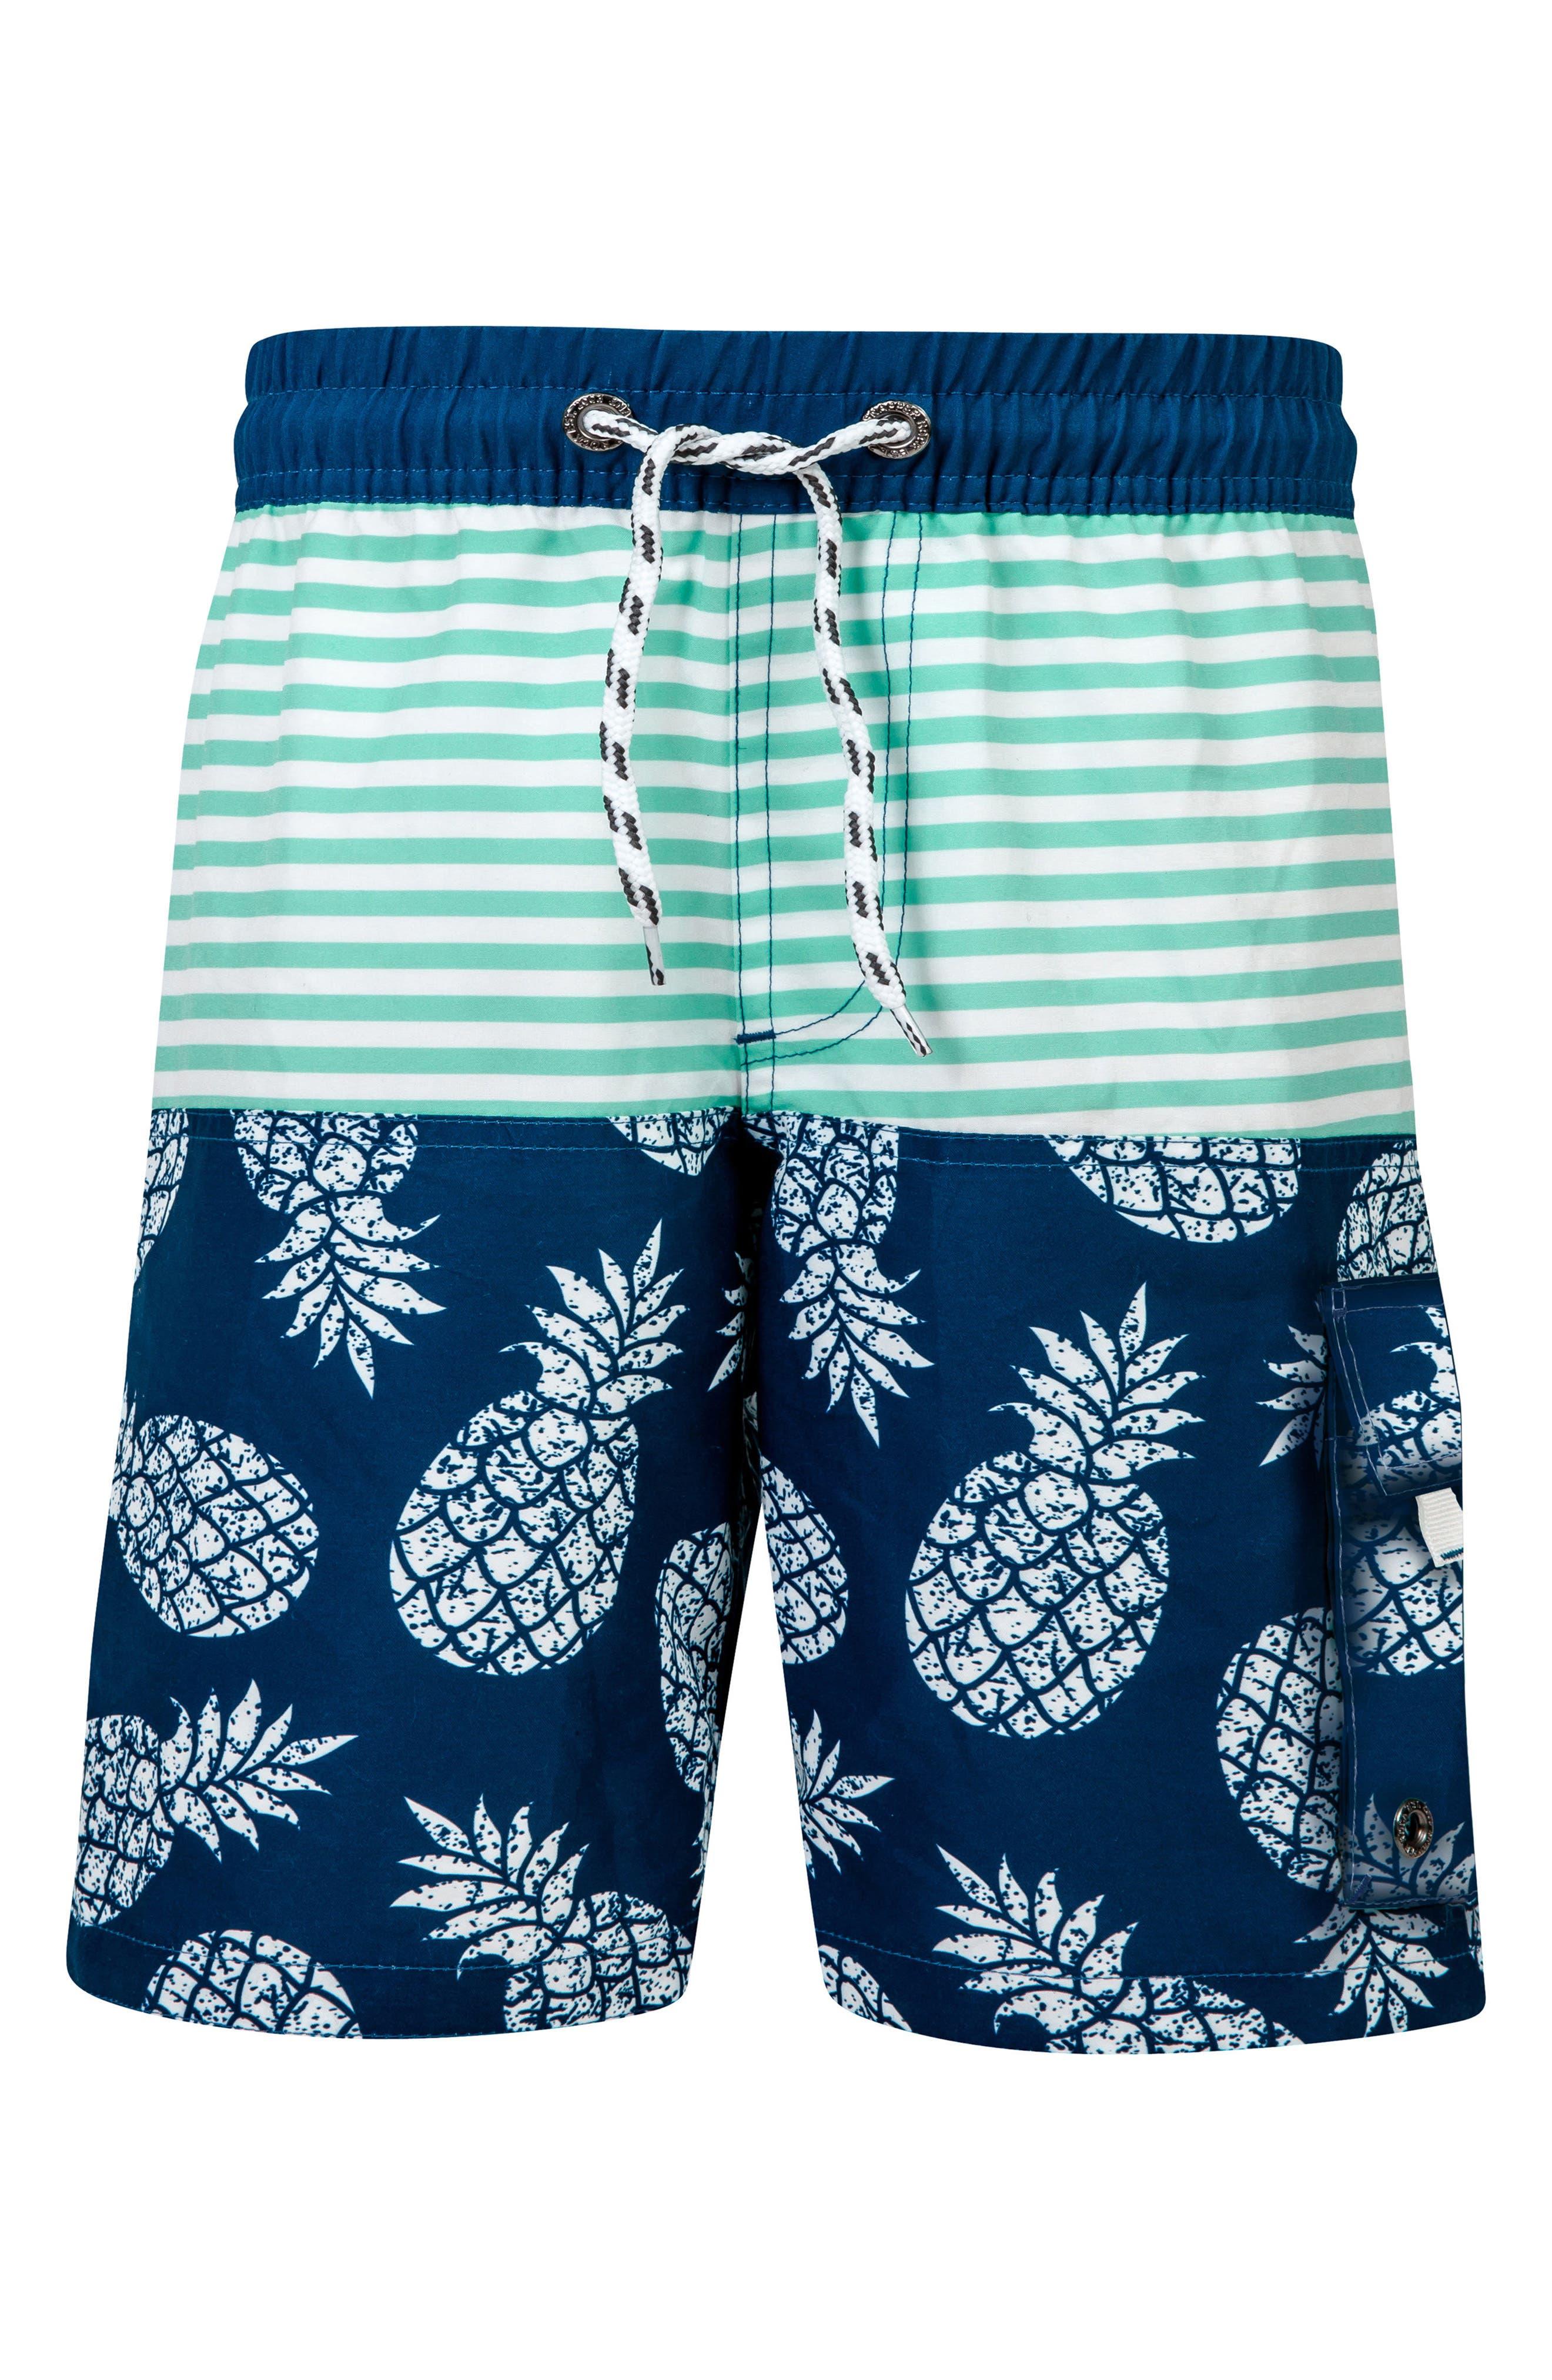 Alternate Image 1 Selected - Snapper Rock Pineapple Mint Stripe Board Shorts (Big Boys)